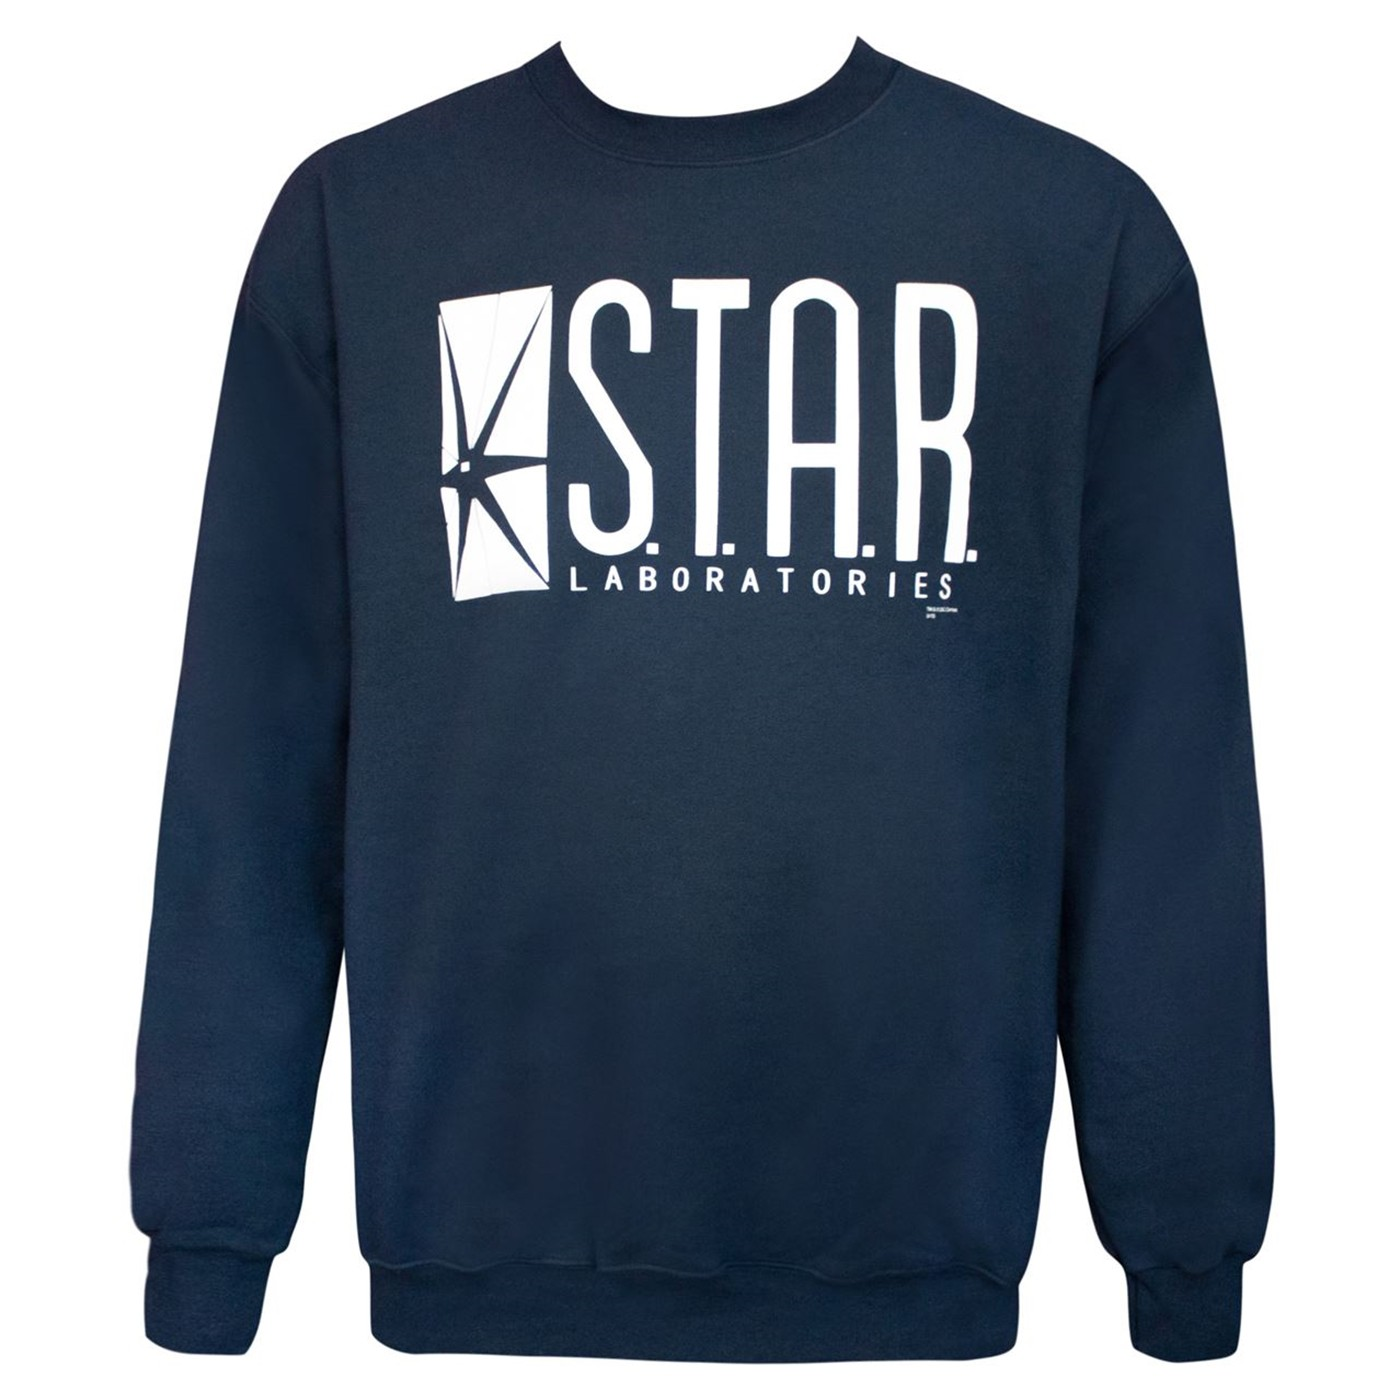 Star Laboratories Navy Crew Neck Sweatshirt